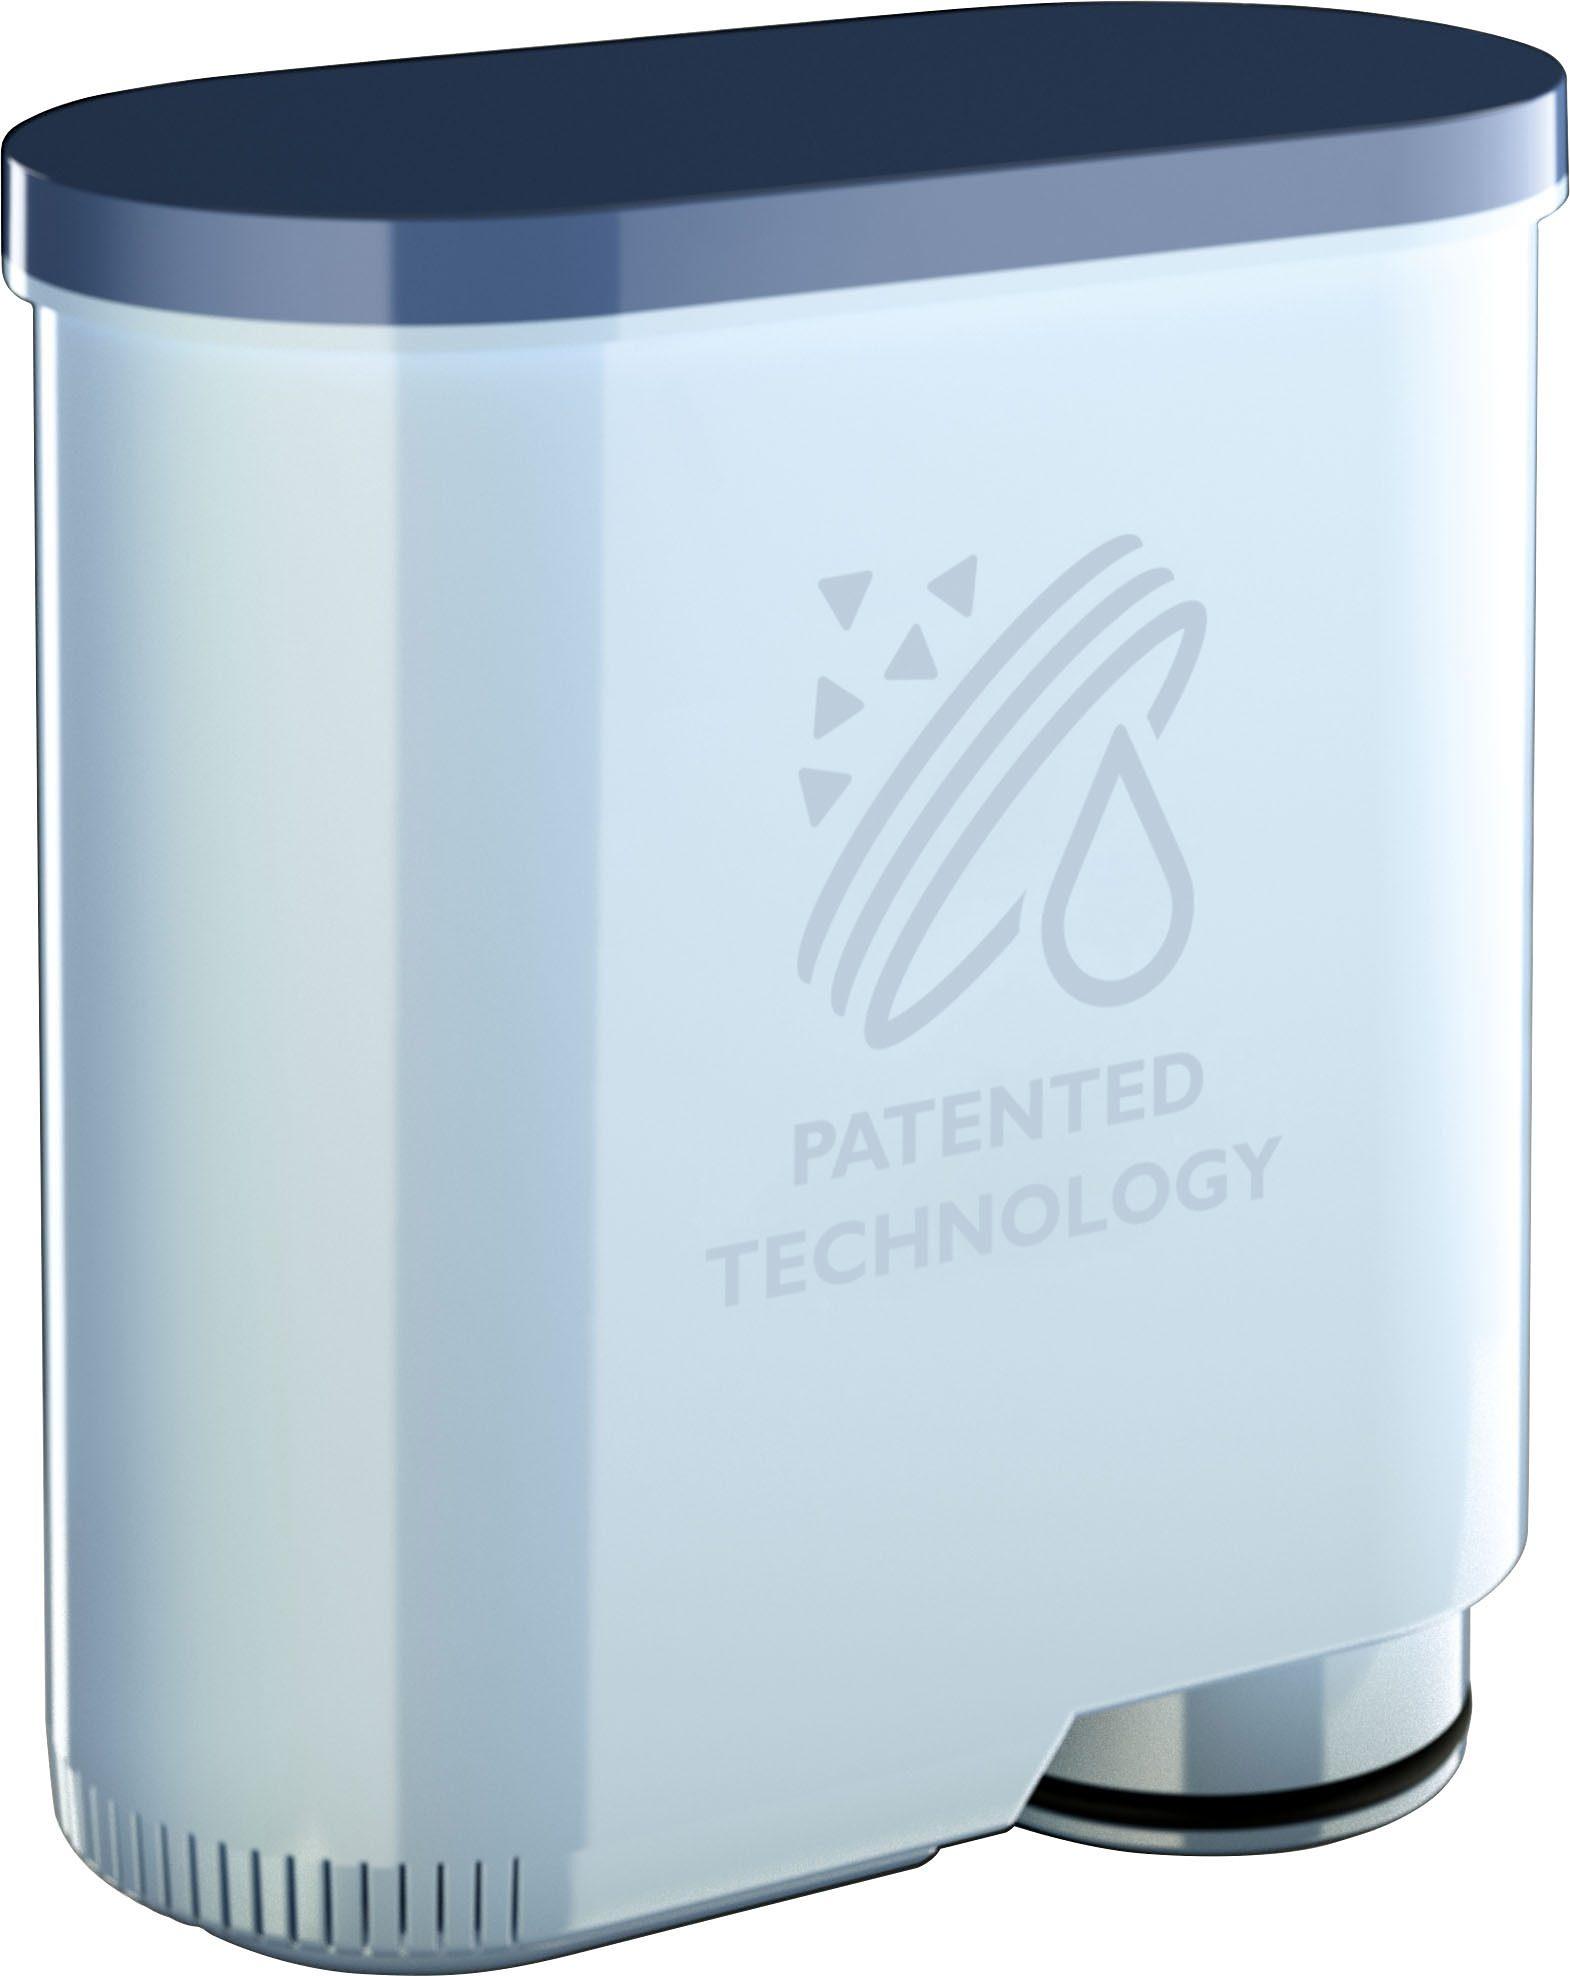 Saeco Kalk- und Wasserfilter CA6903/00 AquaClean